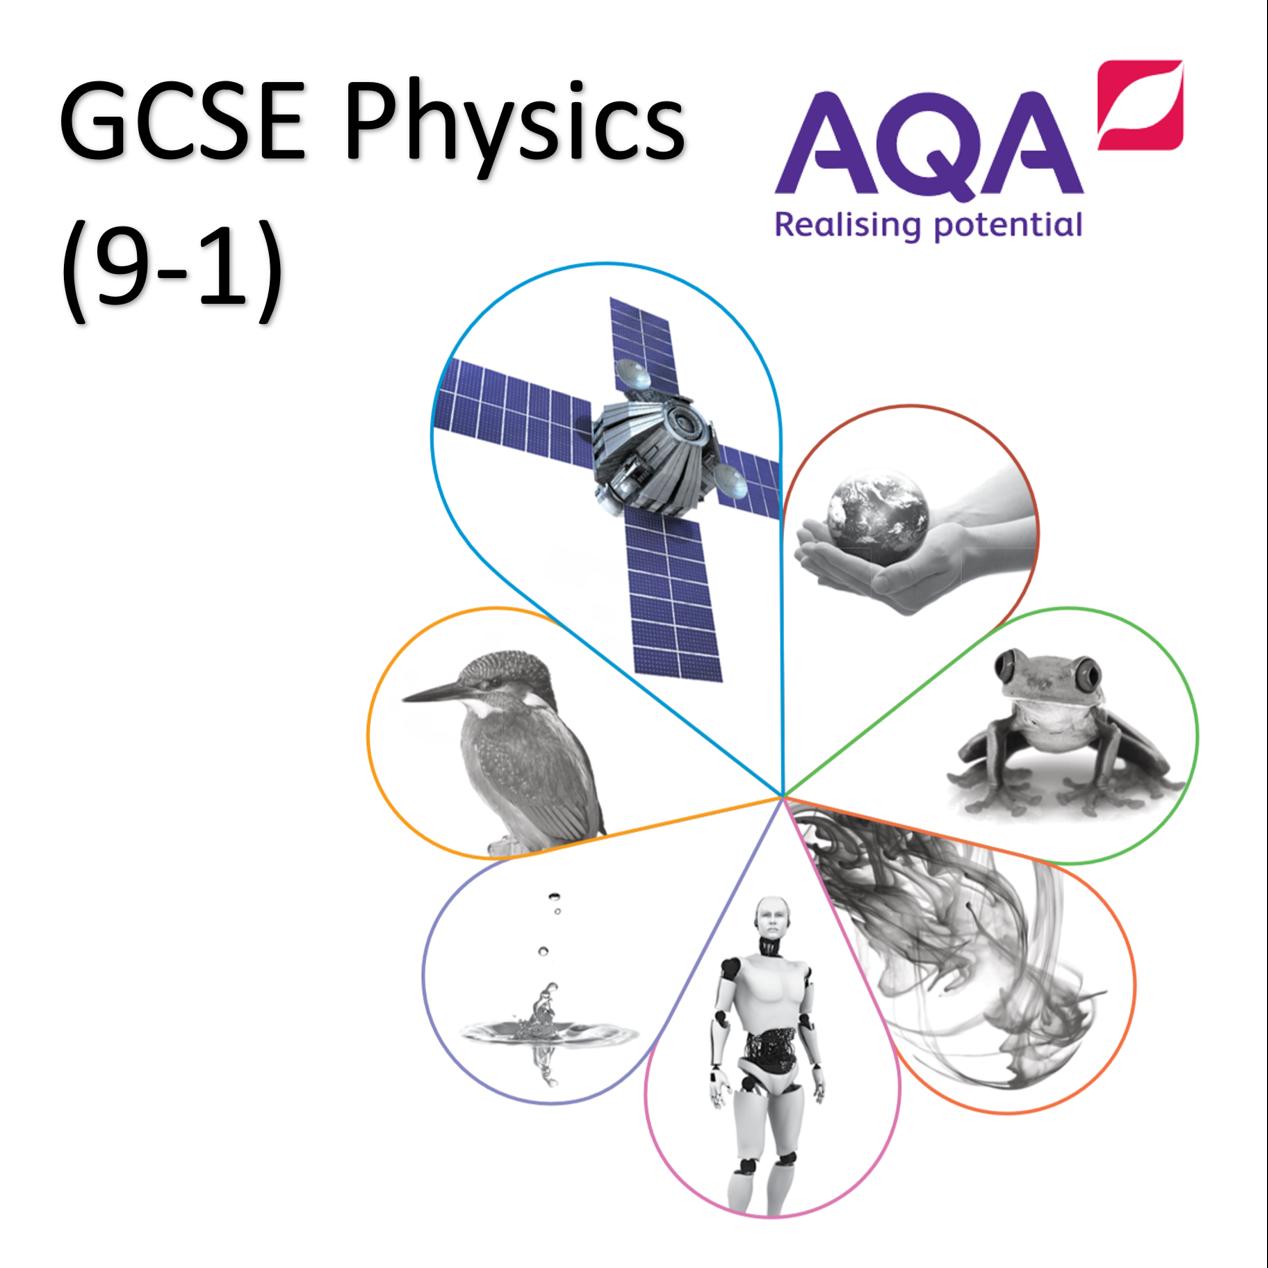 AQA GCSE Physics (9-1) Paper1&2 Double Science Revision Summary Sheets